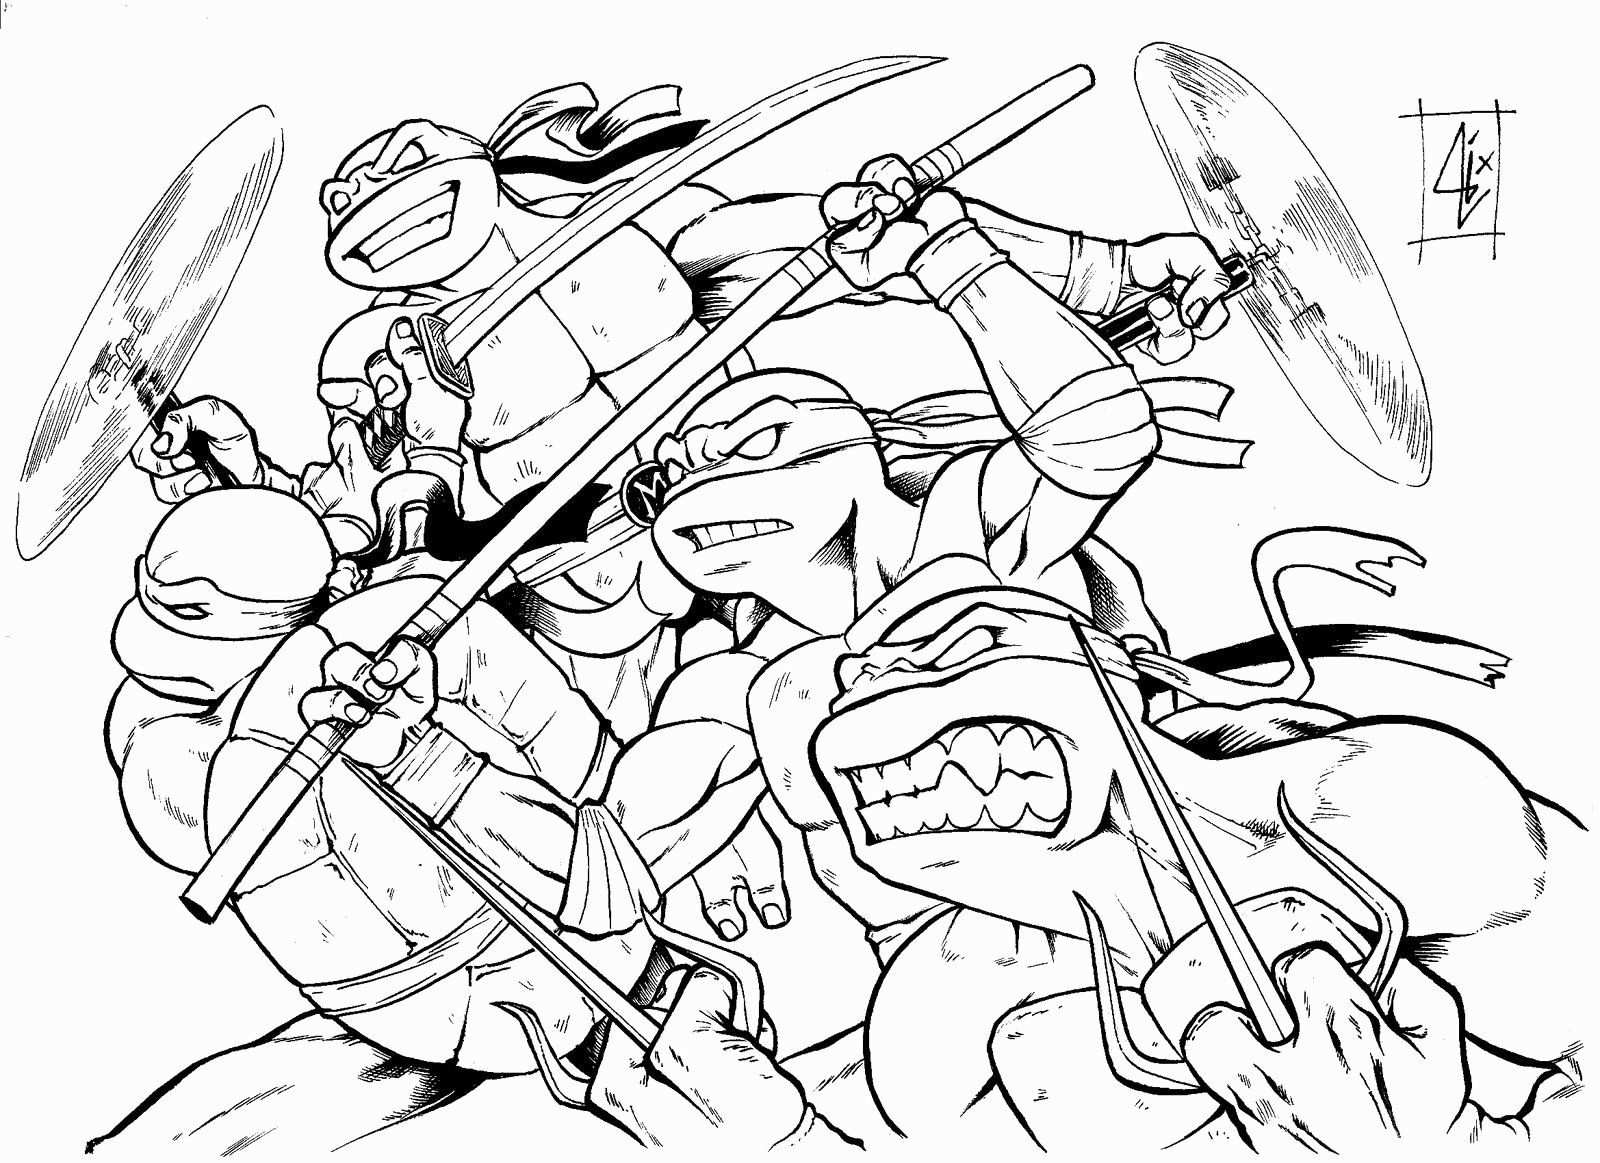 Teenage Mutant Ninja Turtles Coloring Book Inspirational